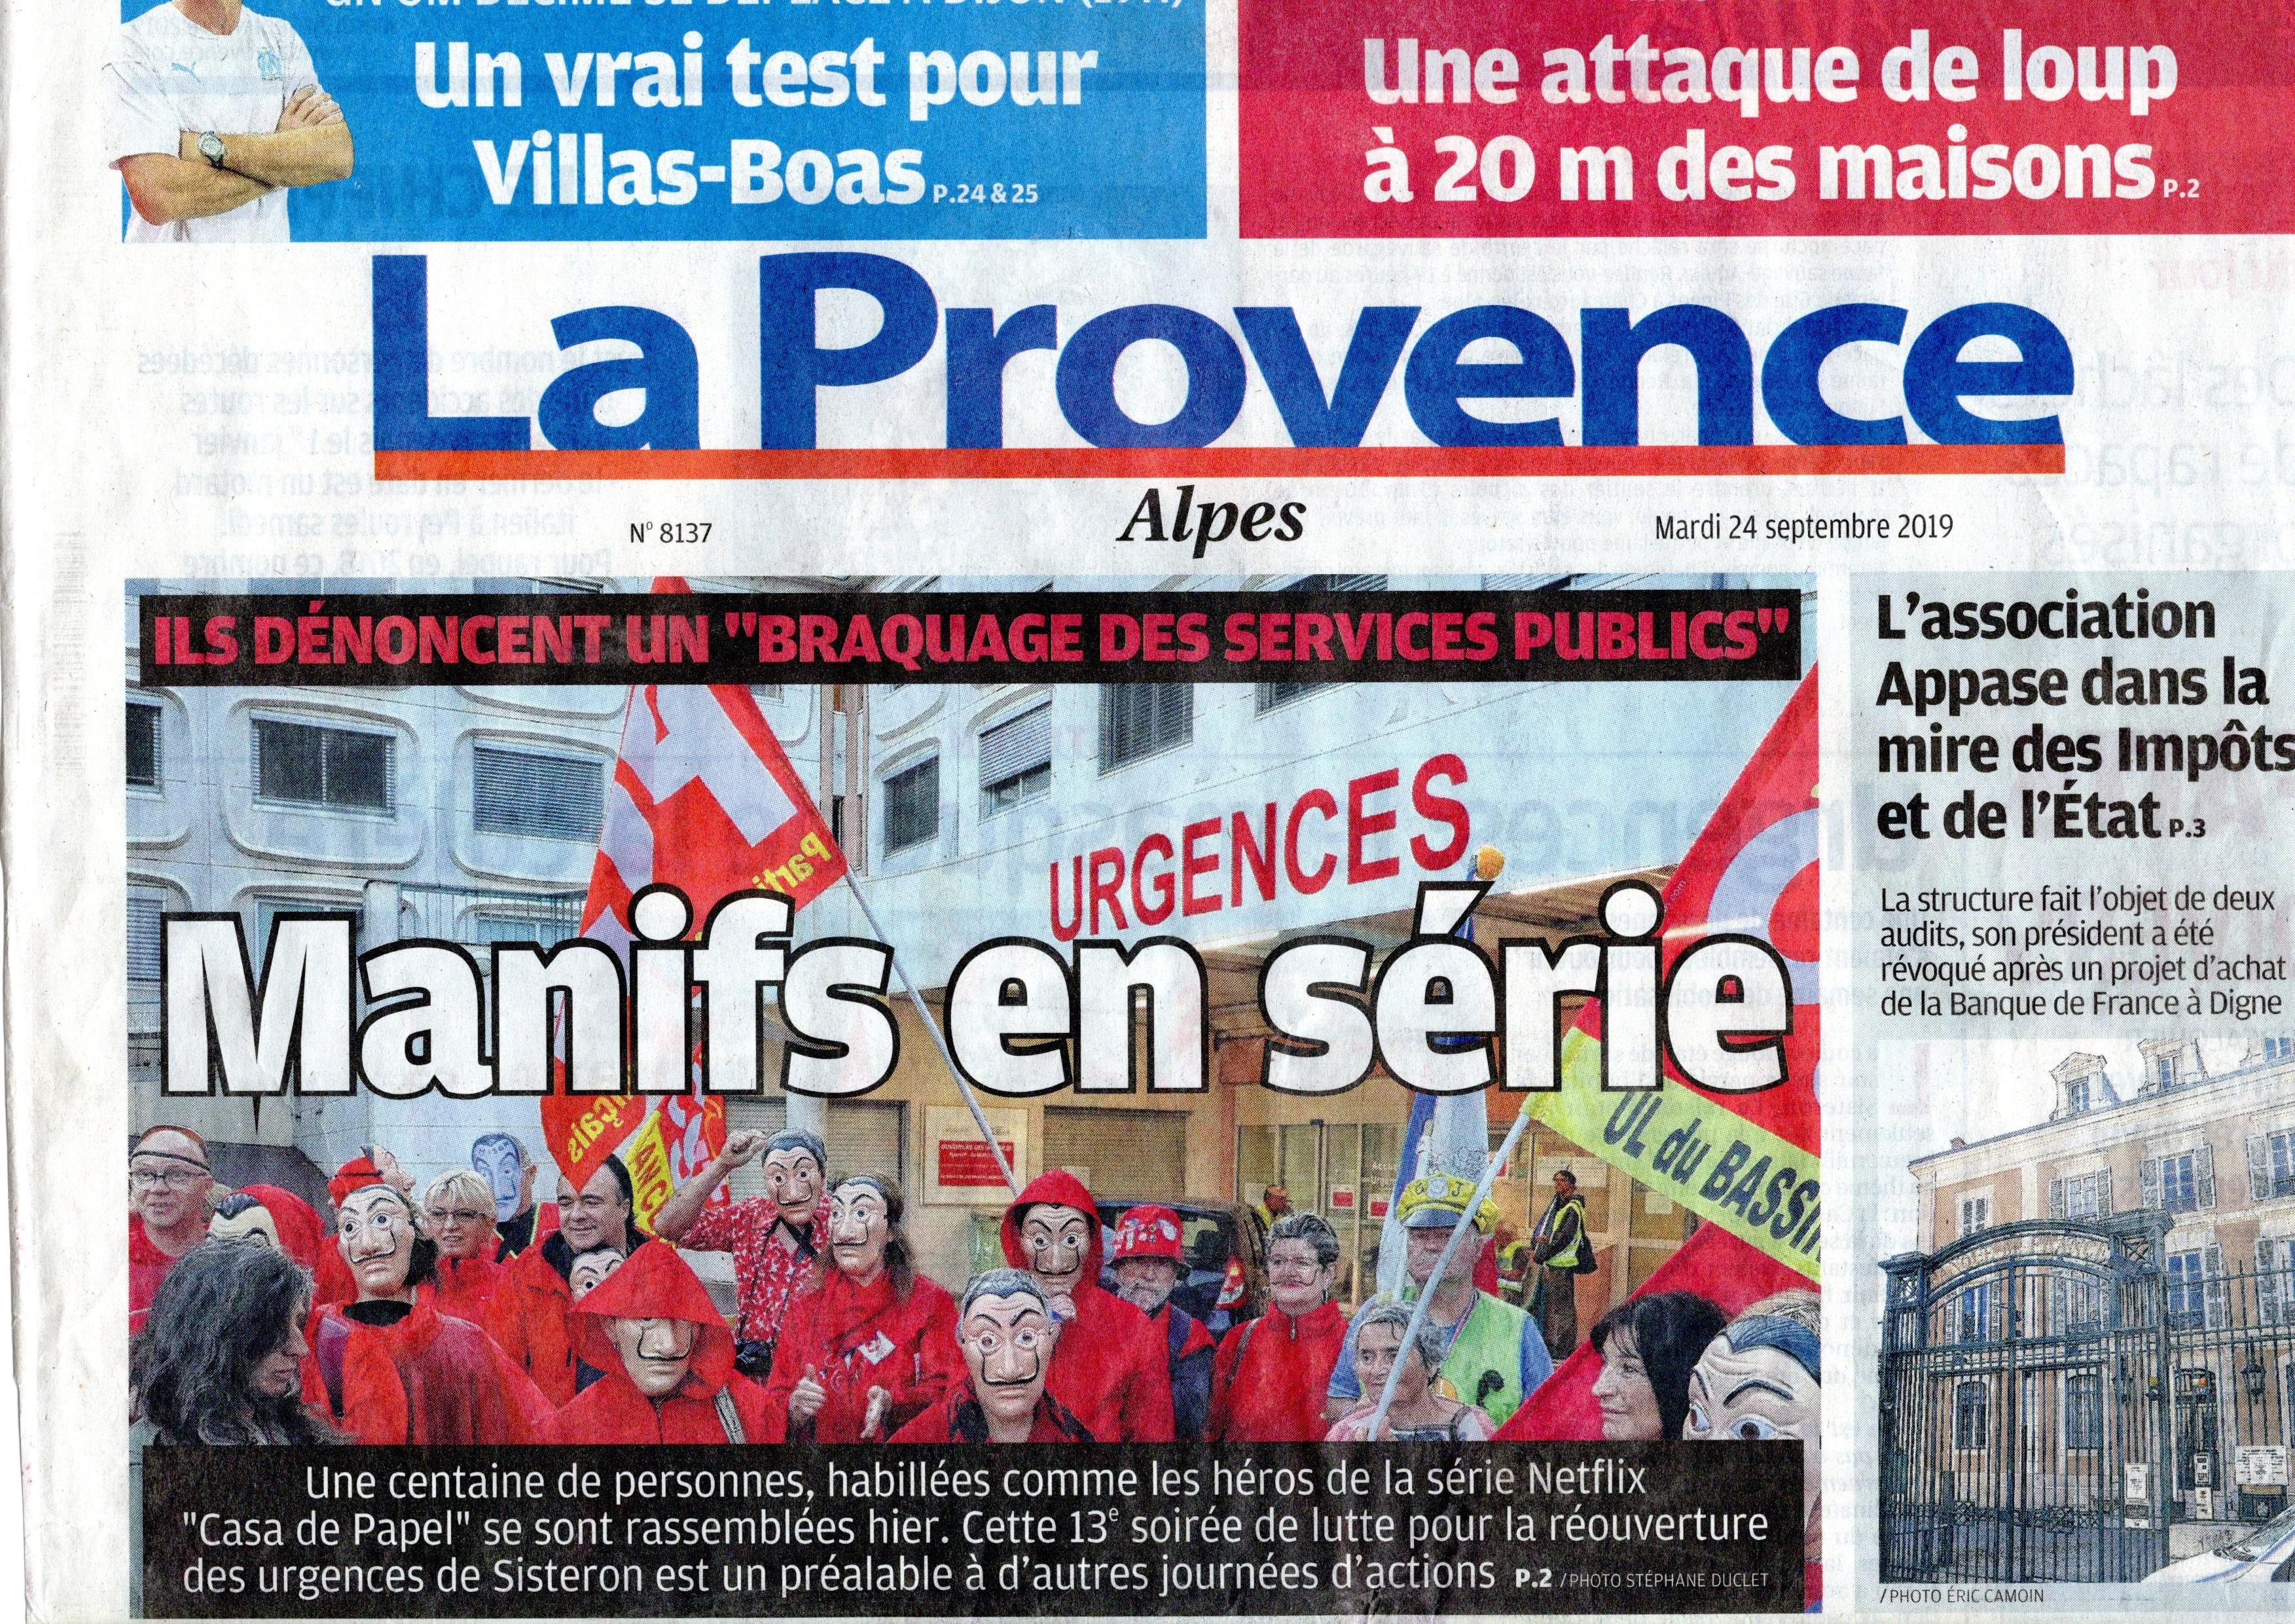 La Provence page 1 Urgences Sisteron Casa de Papel